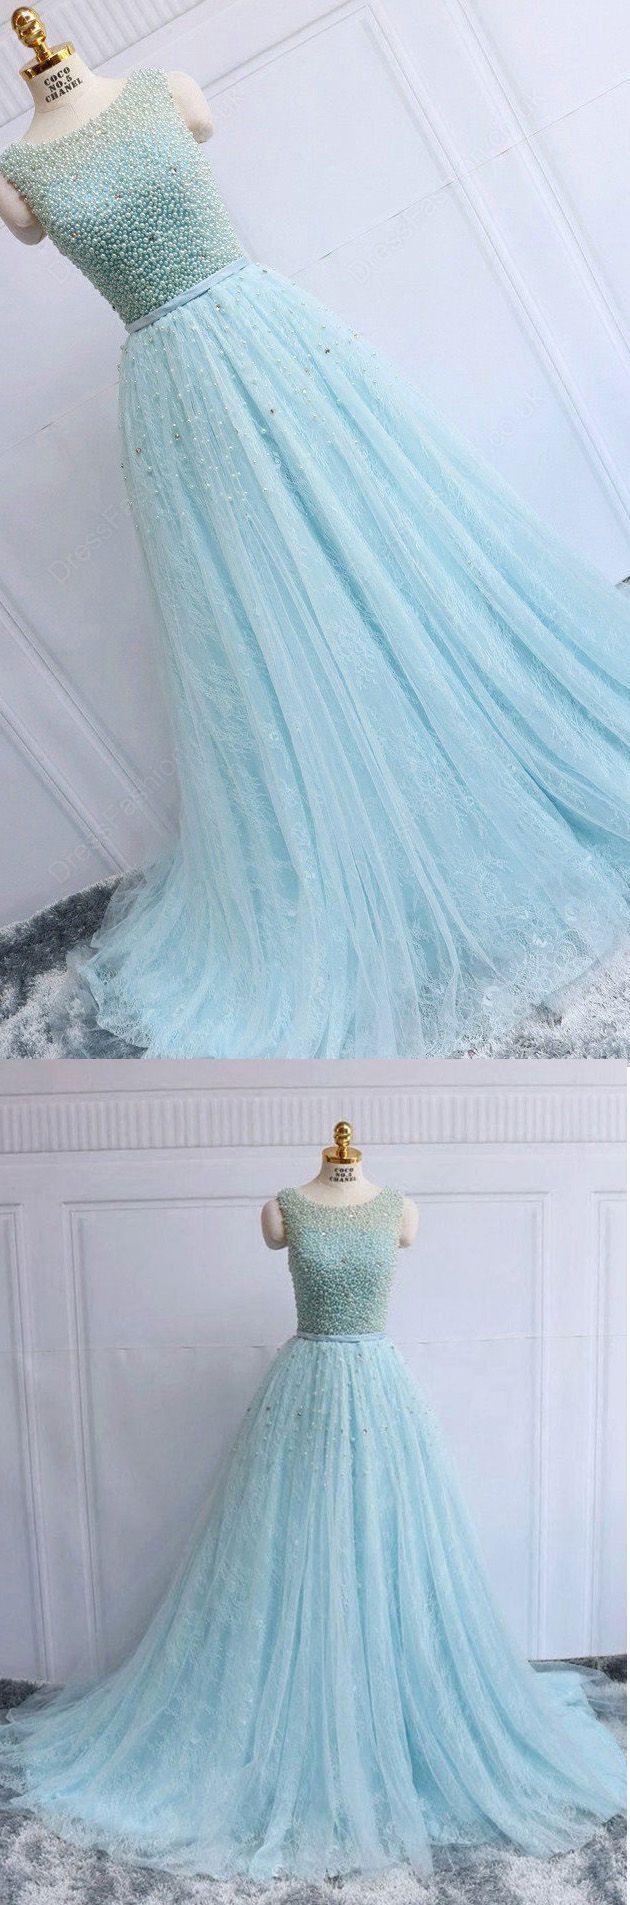 Discount alineprincess evening prom dresses long light blue